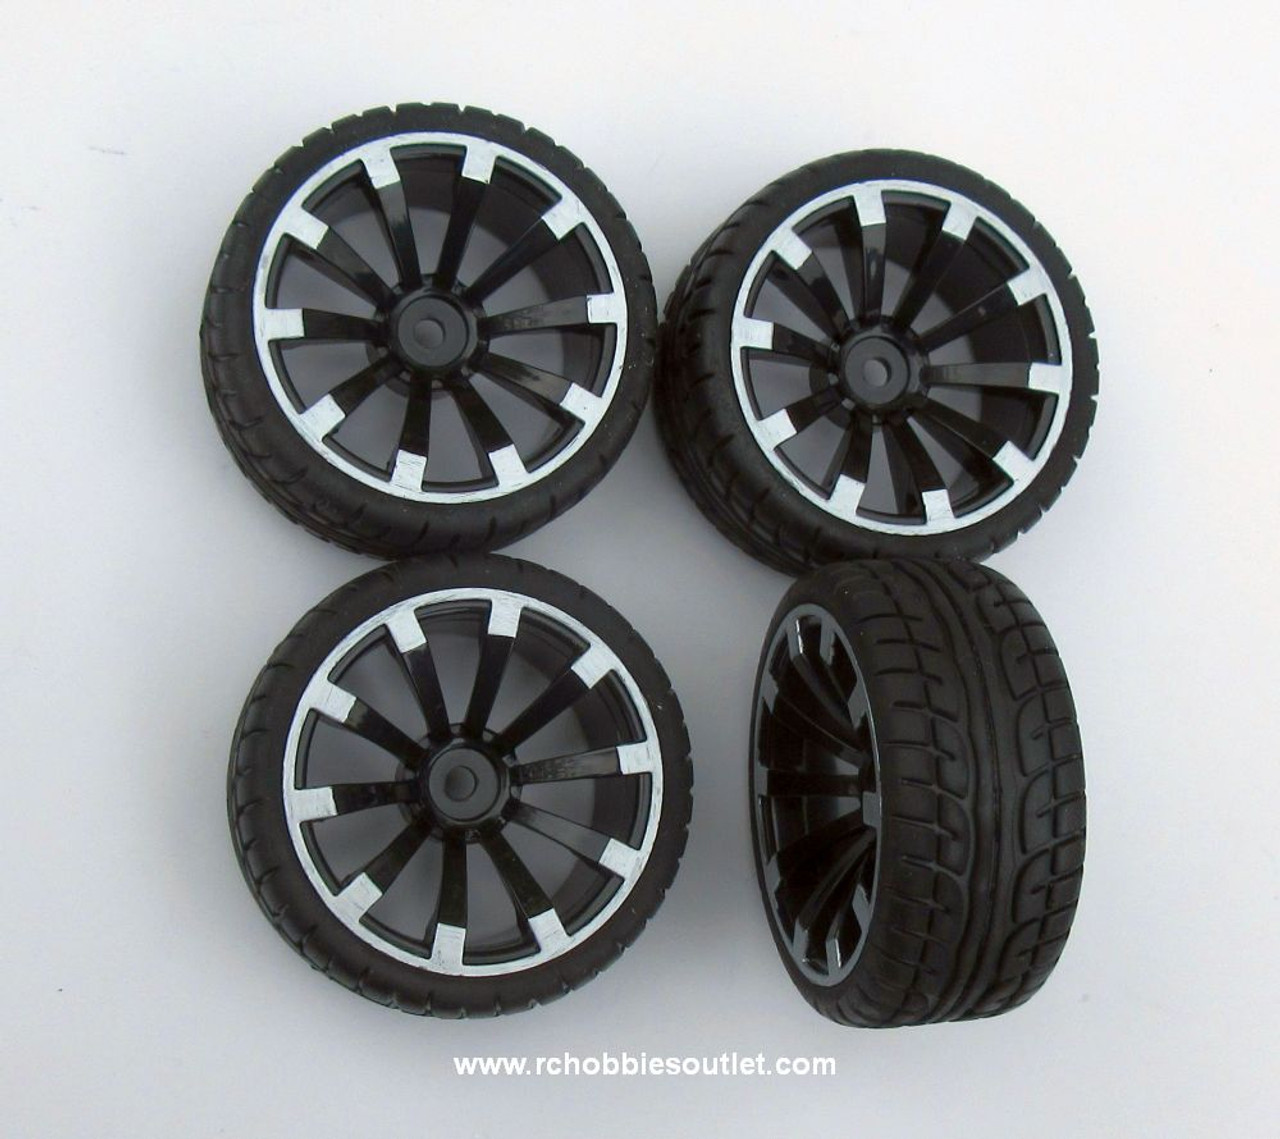 02020 02185 1/10 Scale Wheel -Tire and Silver/Black Rim ( Set of 4)